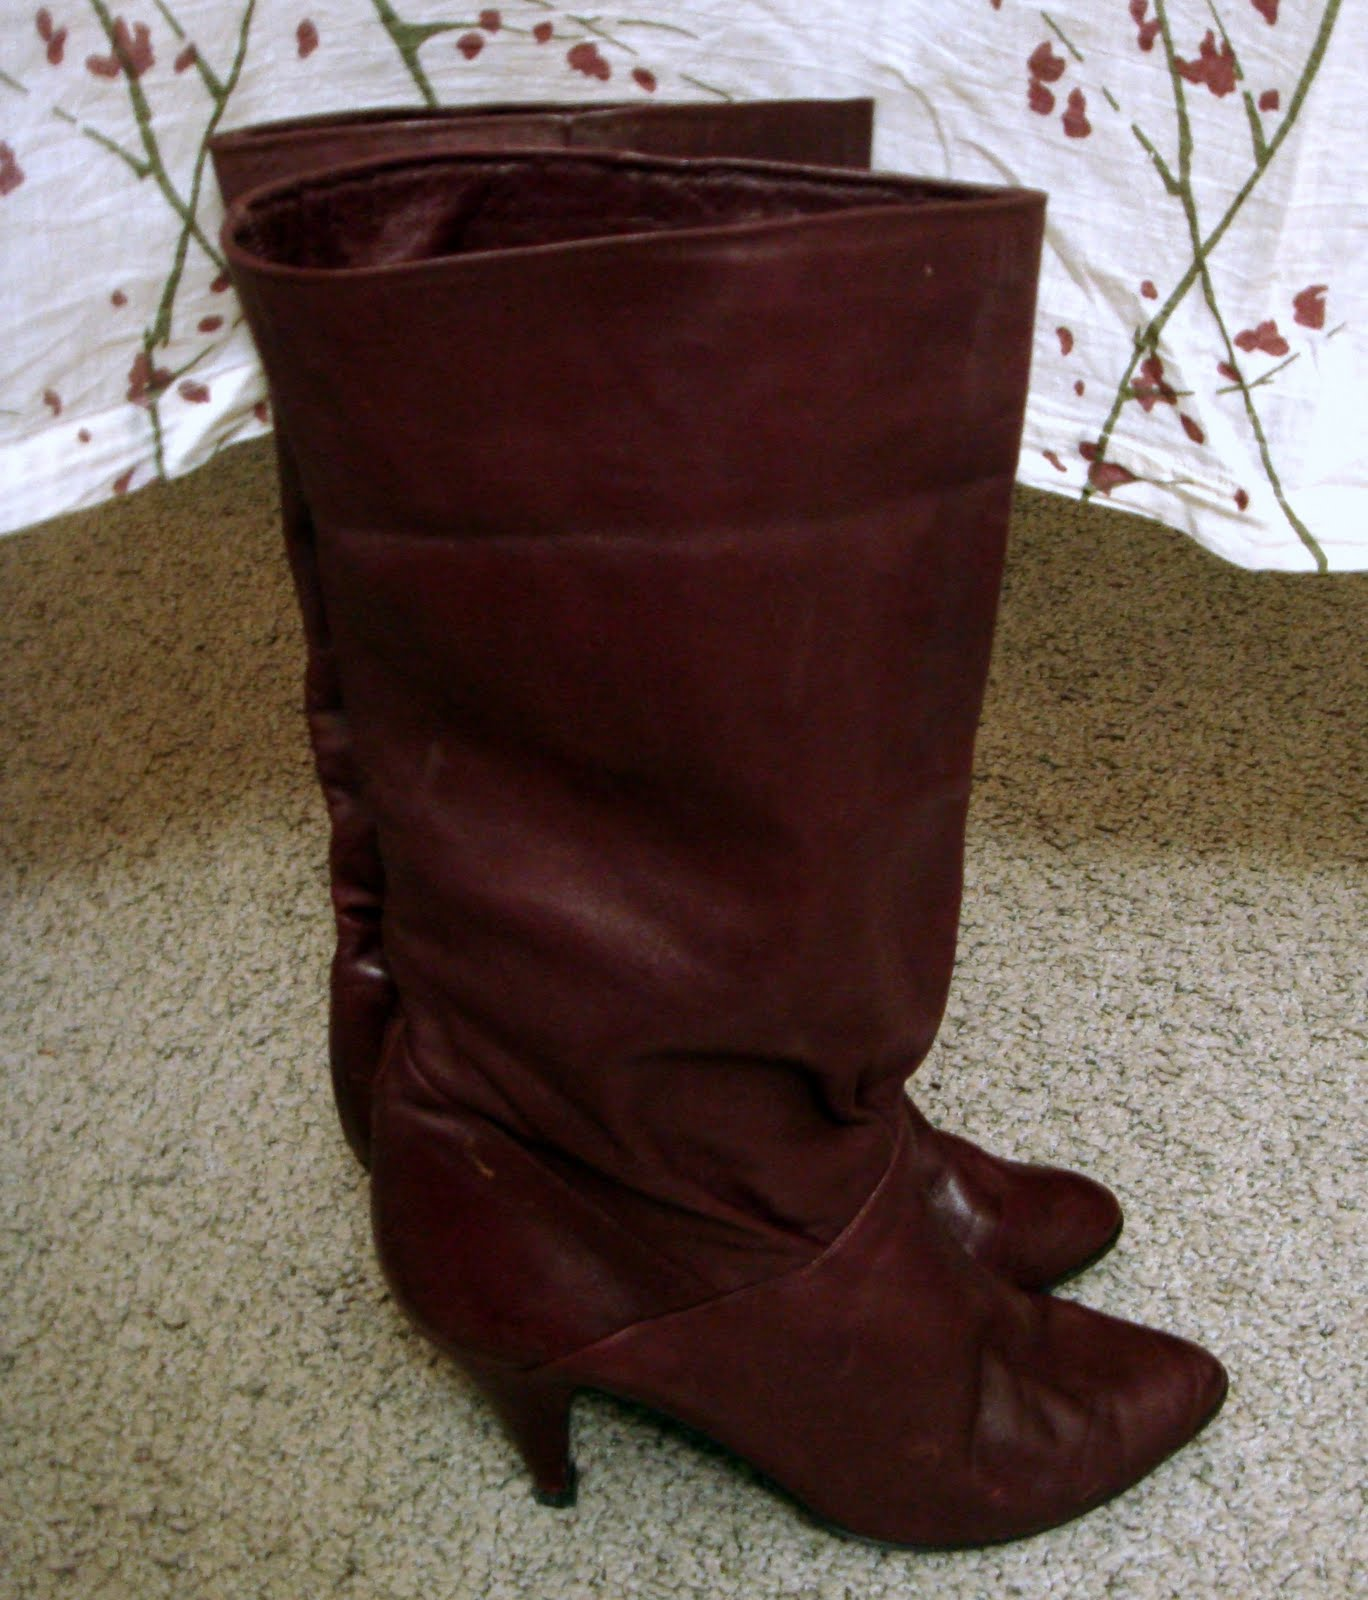 http://2.bp.blogspot.com/_jcAD1iRz_vs/TJFdUTvZXzI/AAAAAAAAAN4/n97cgklMJhM/s1600/Fall+Boots.jpg